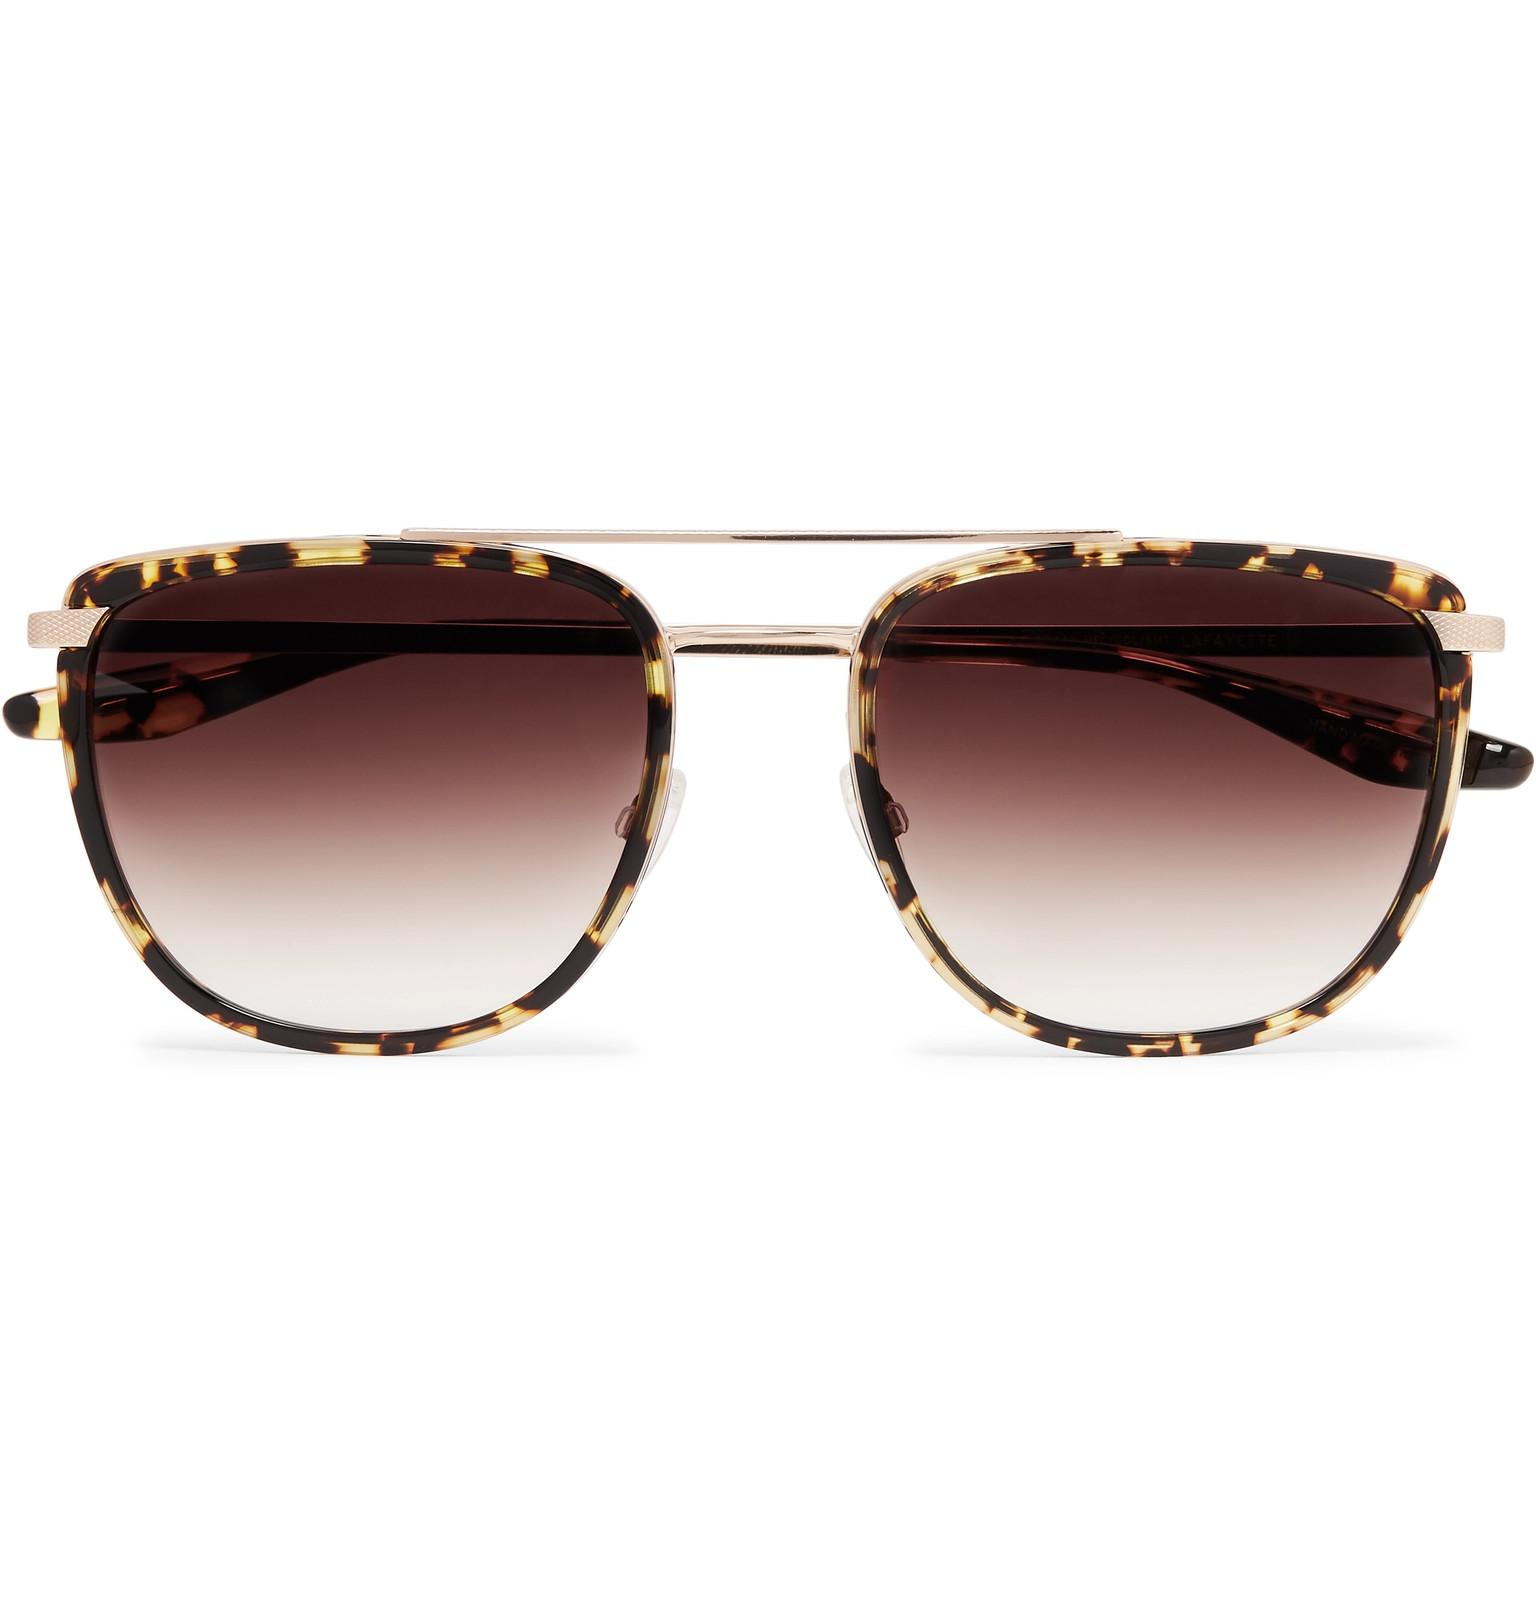 Lafayette Aviatorstyle Acetate And Titanium Sunglasses Barton ...